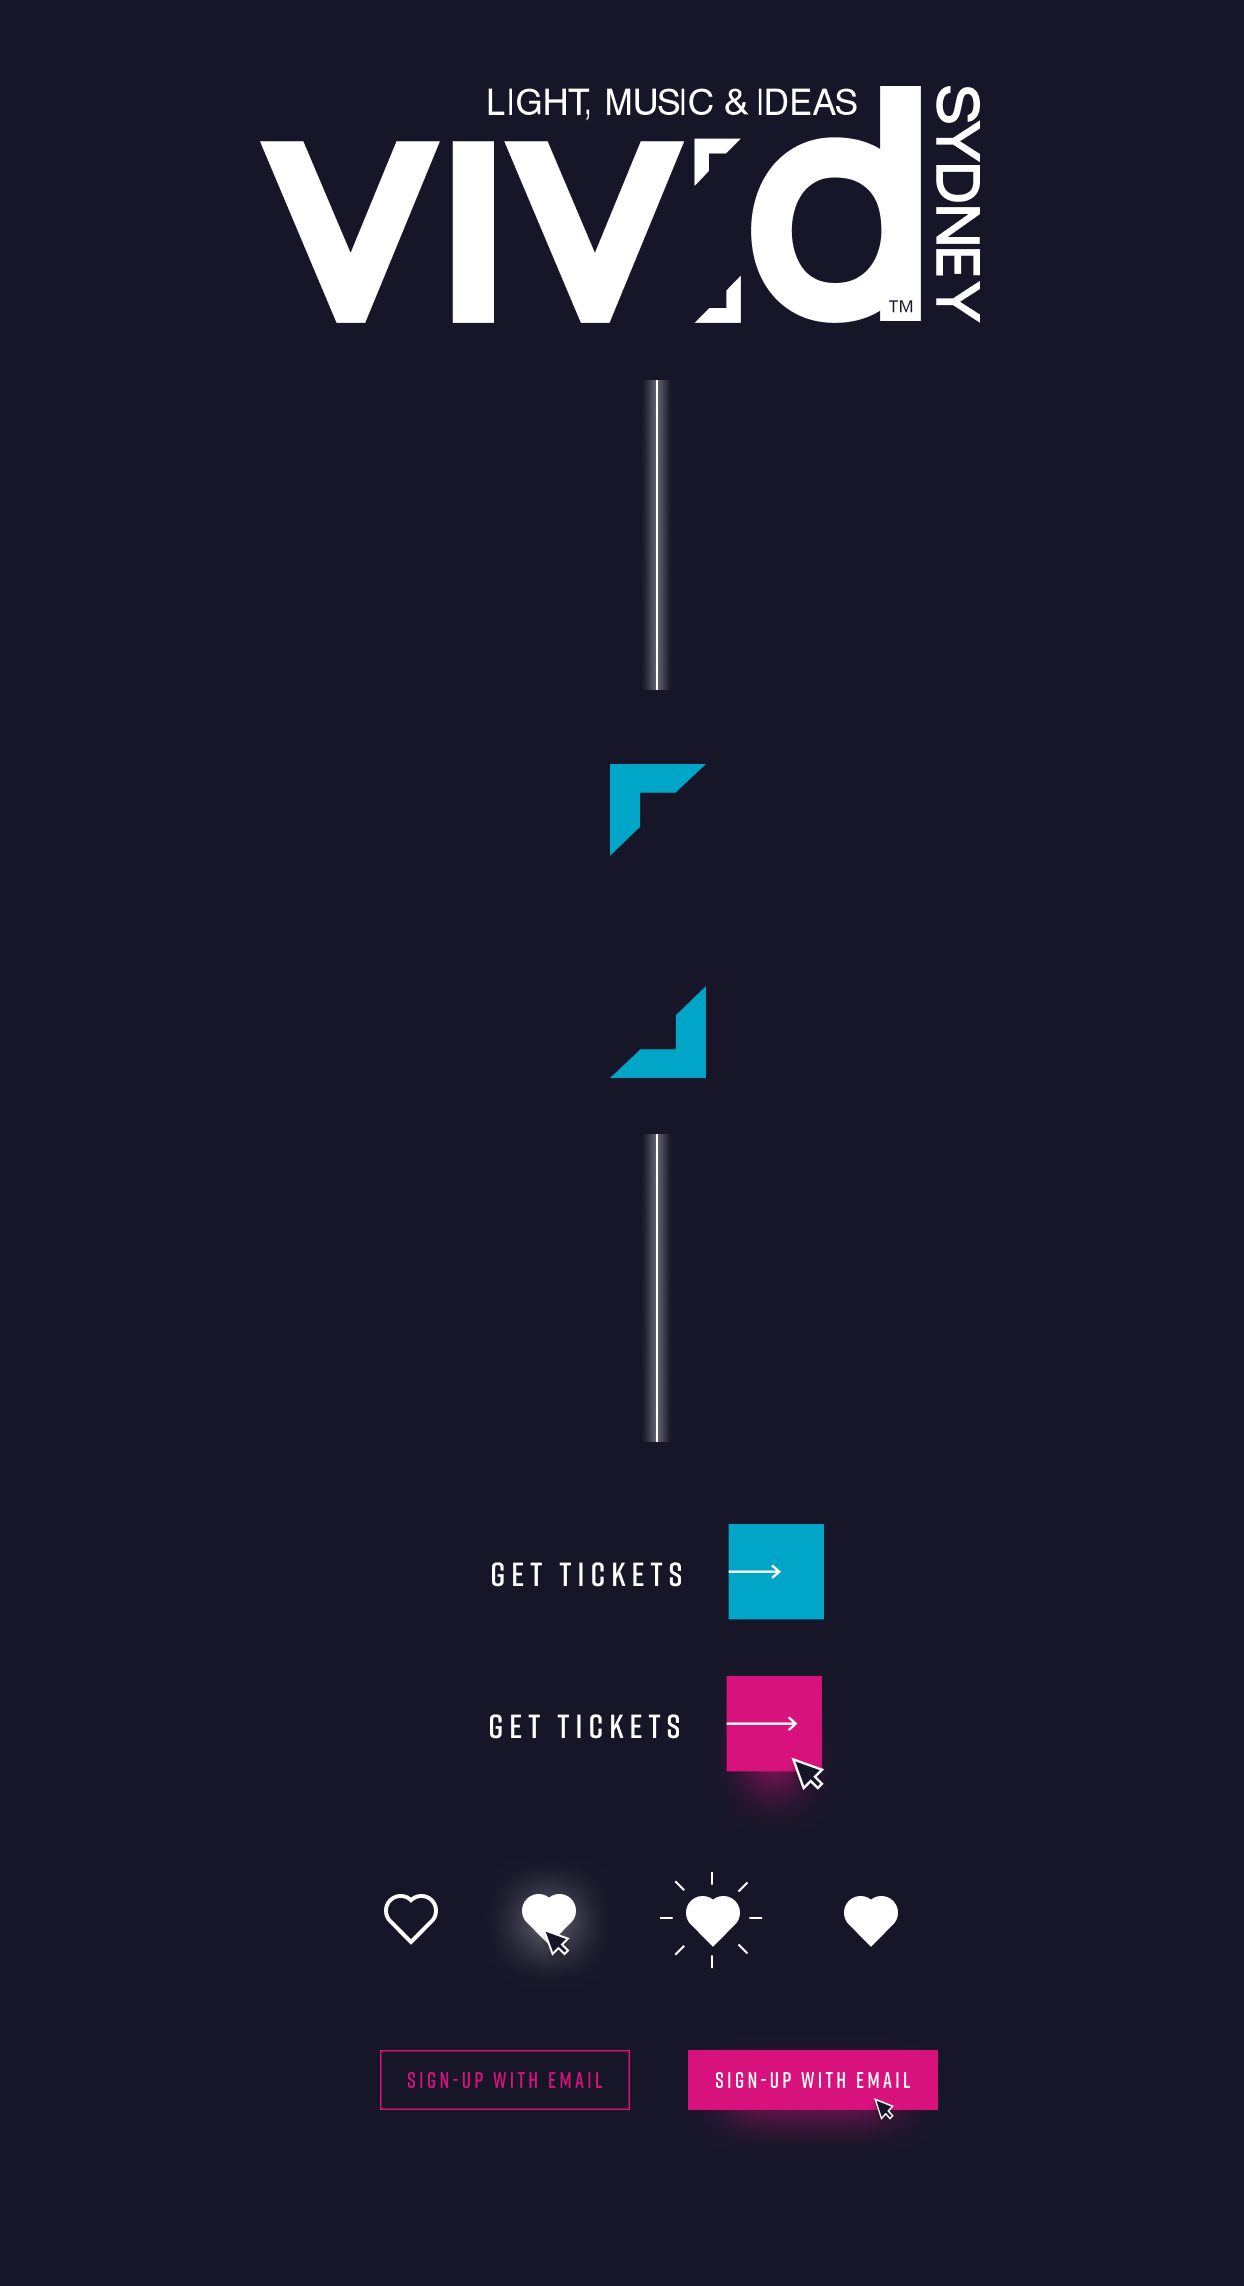 Vivid Sydney website key design interaction states